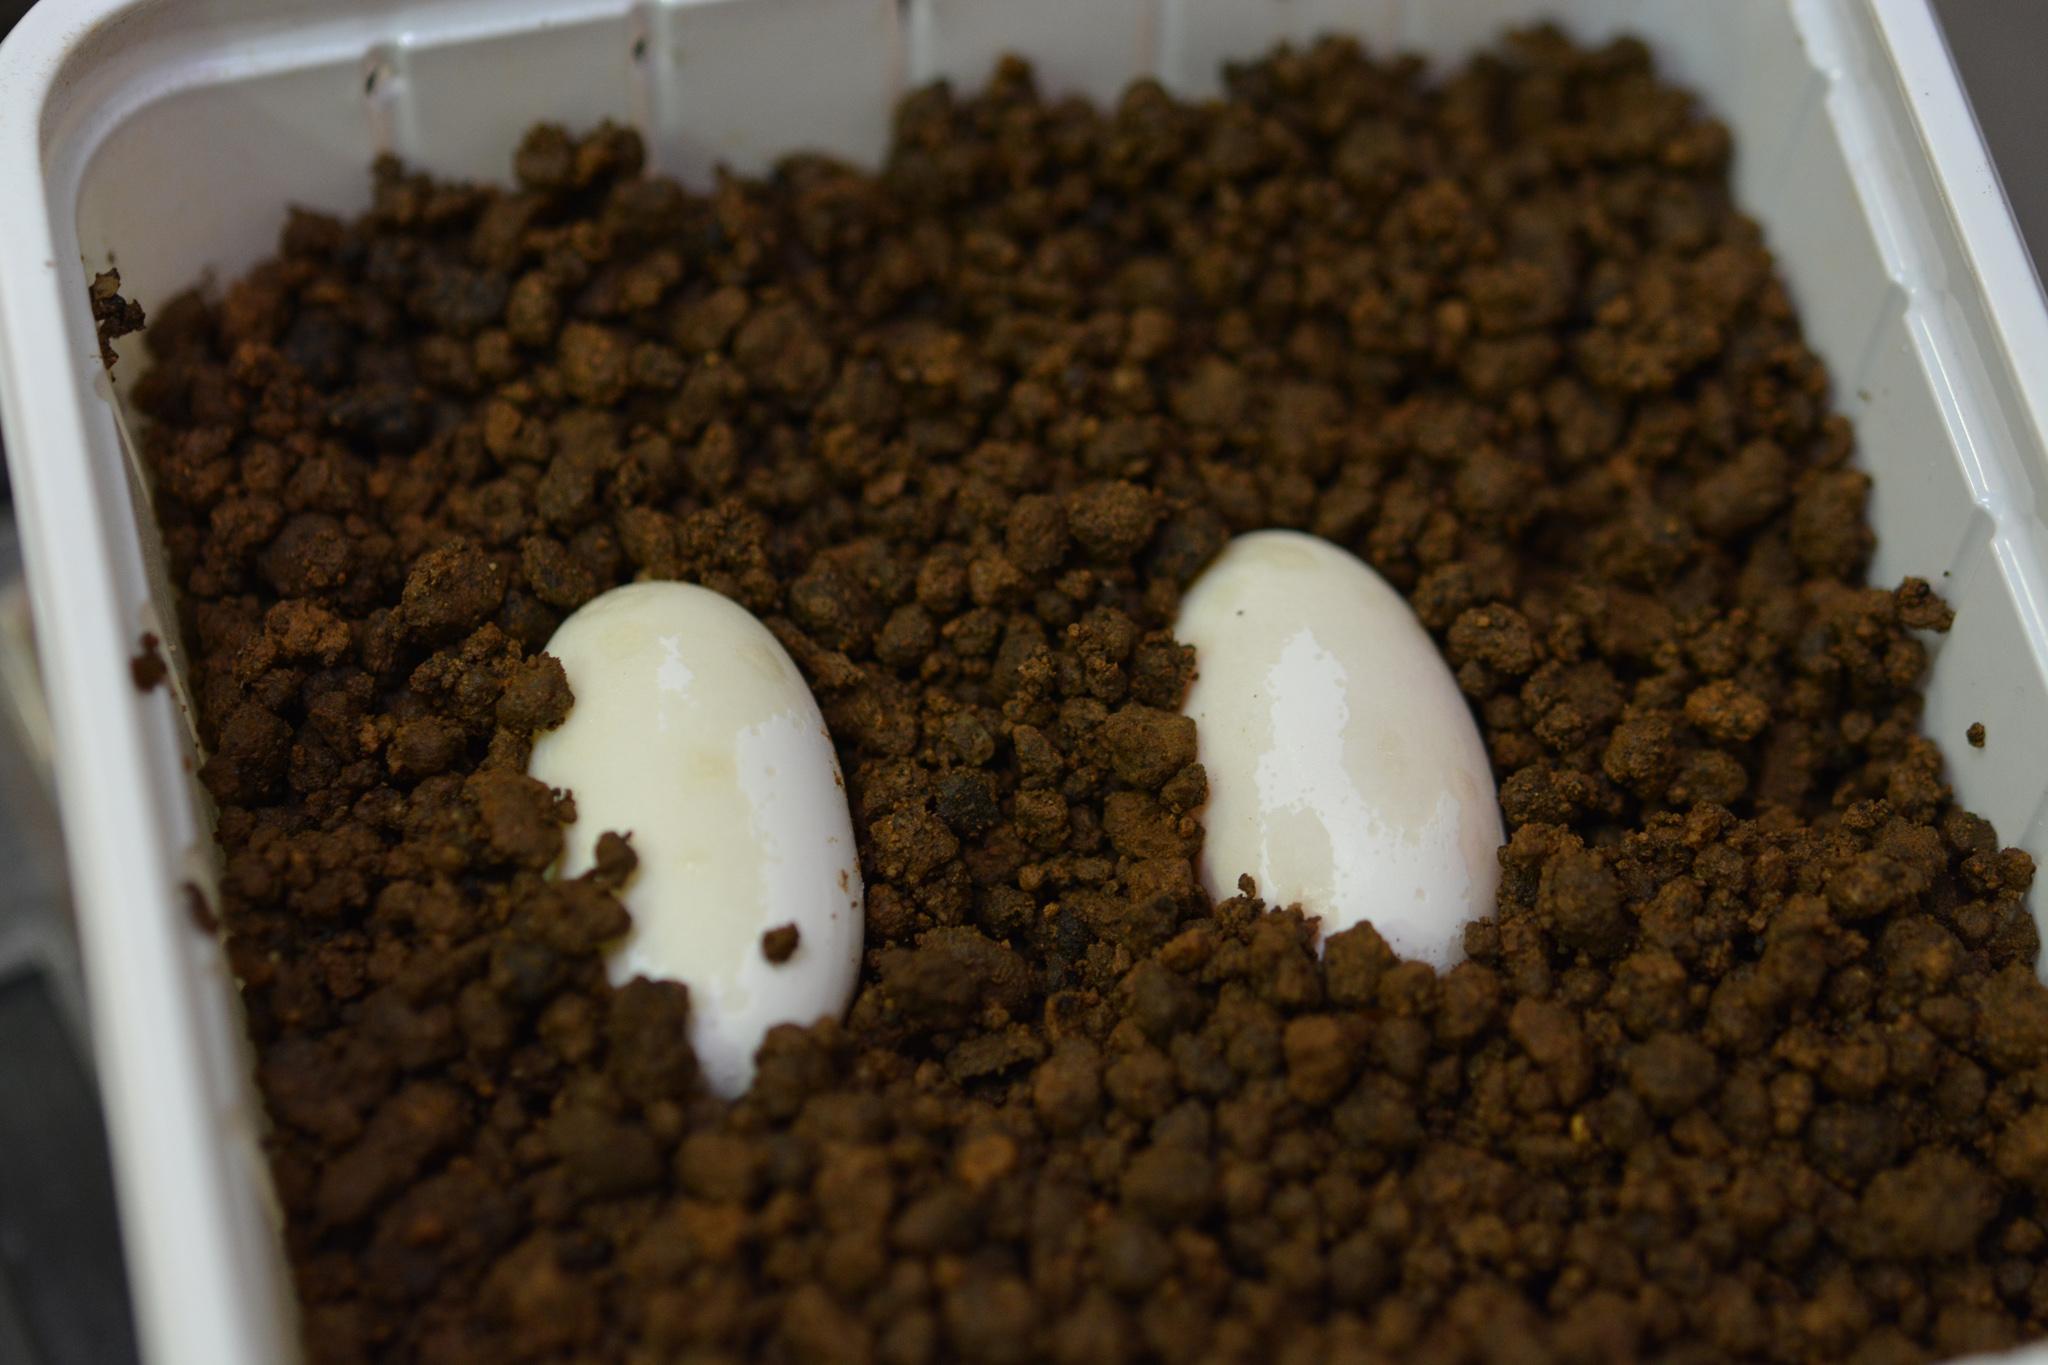 leachianus_eggs01.jpg